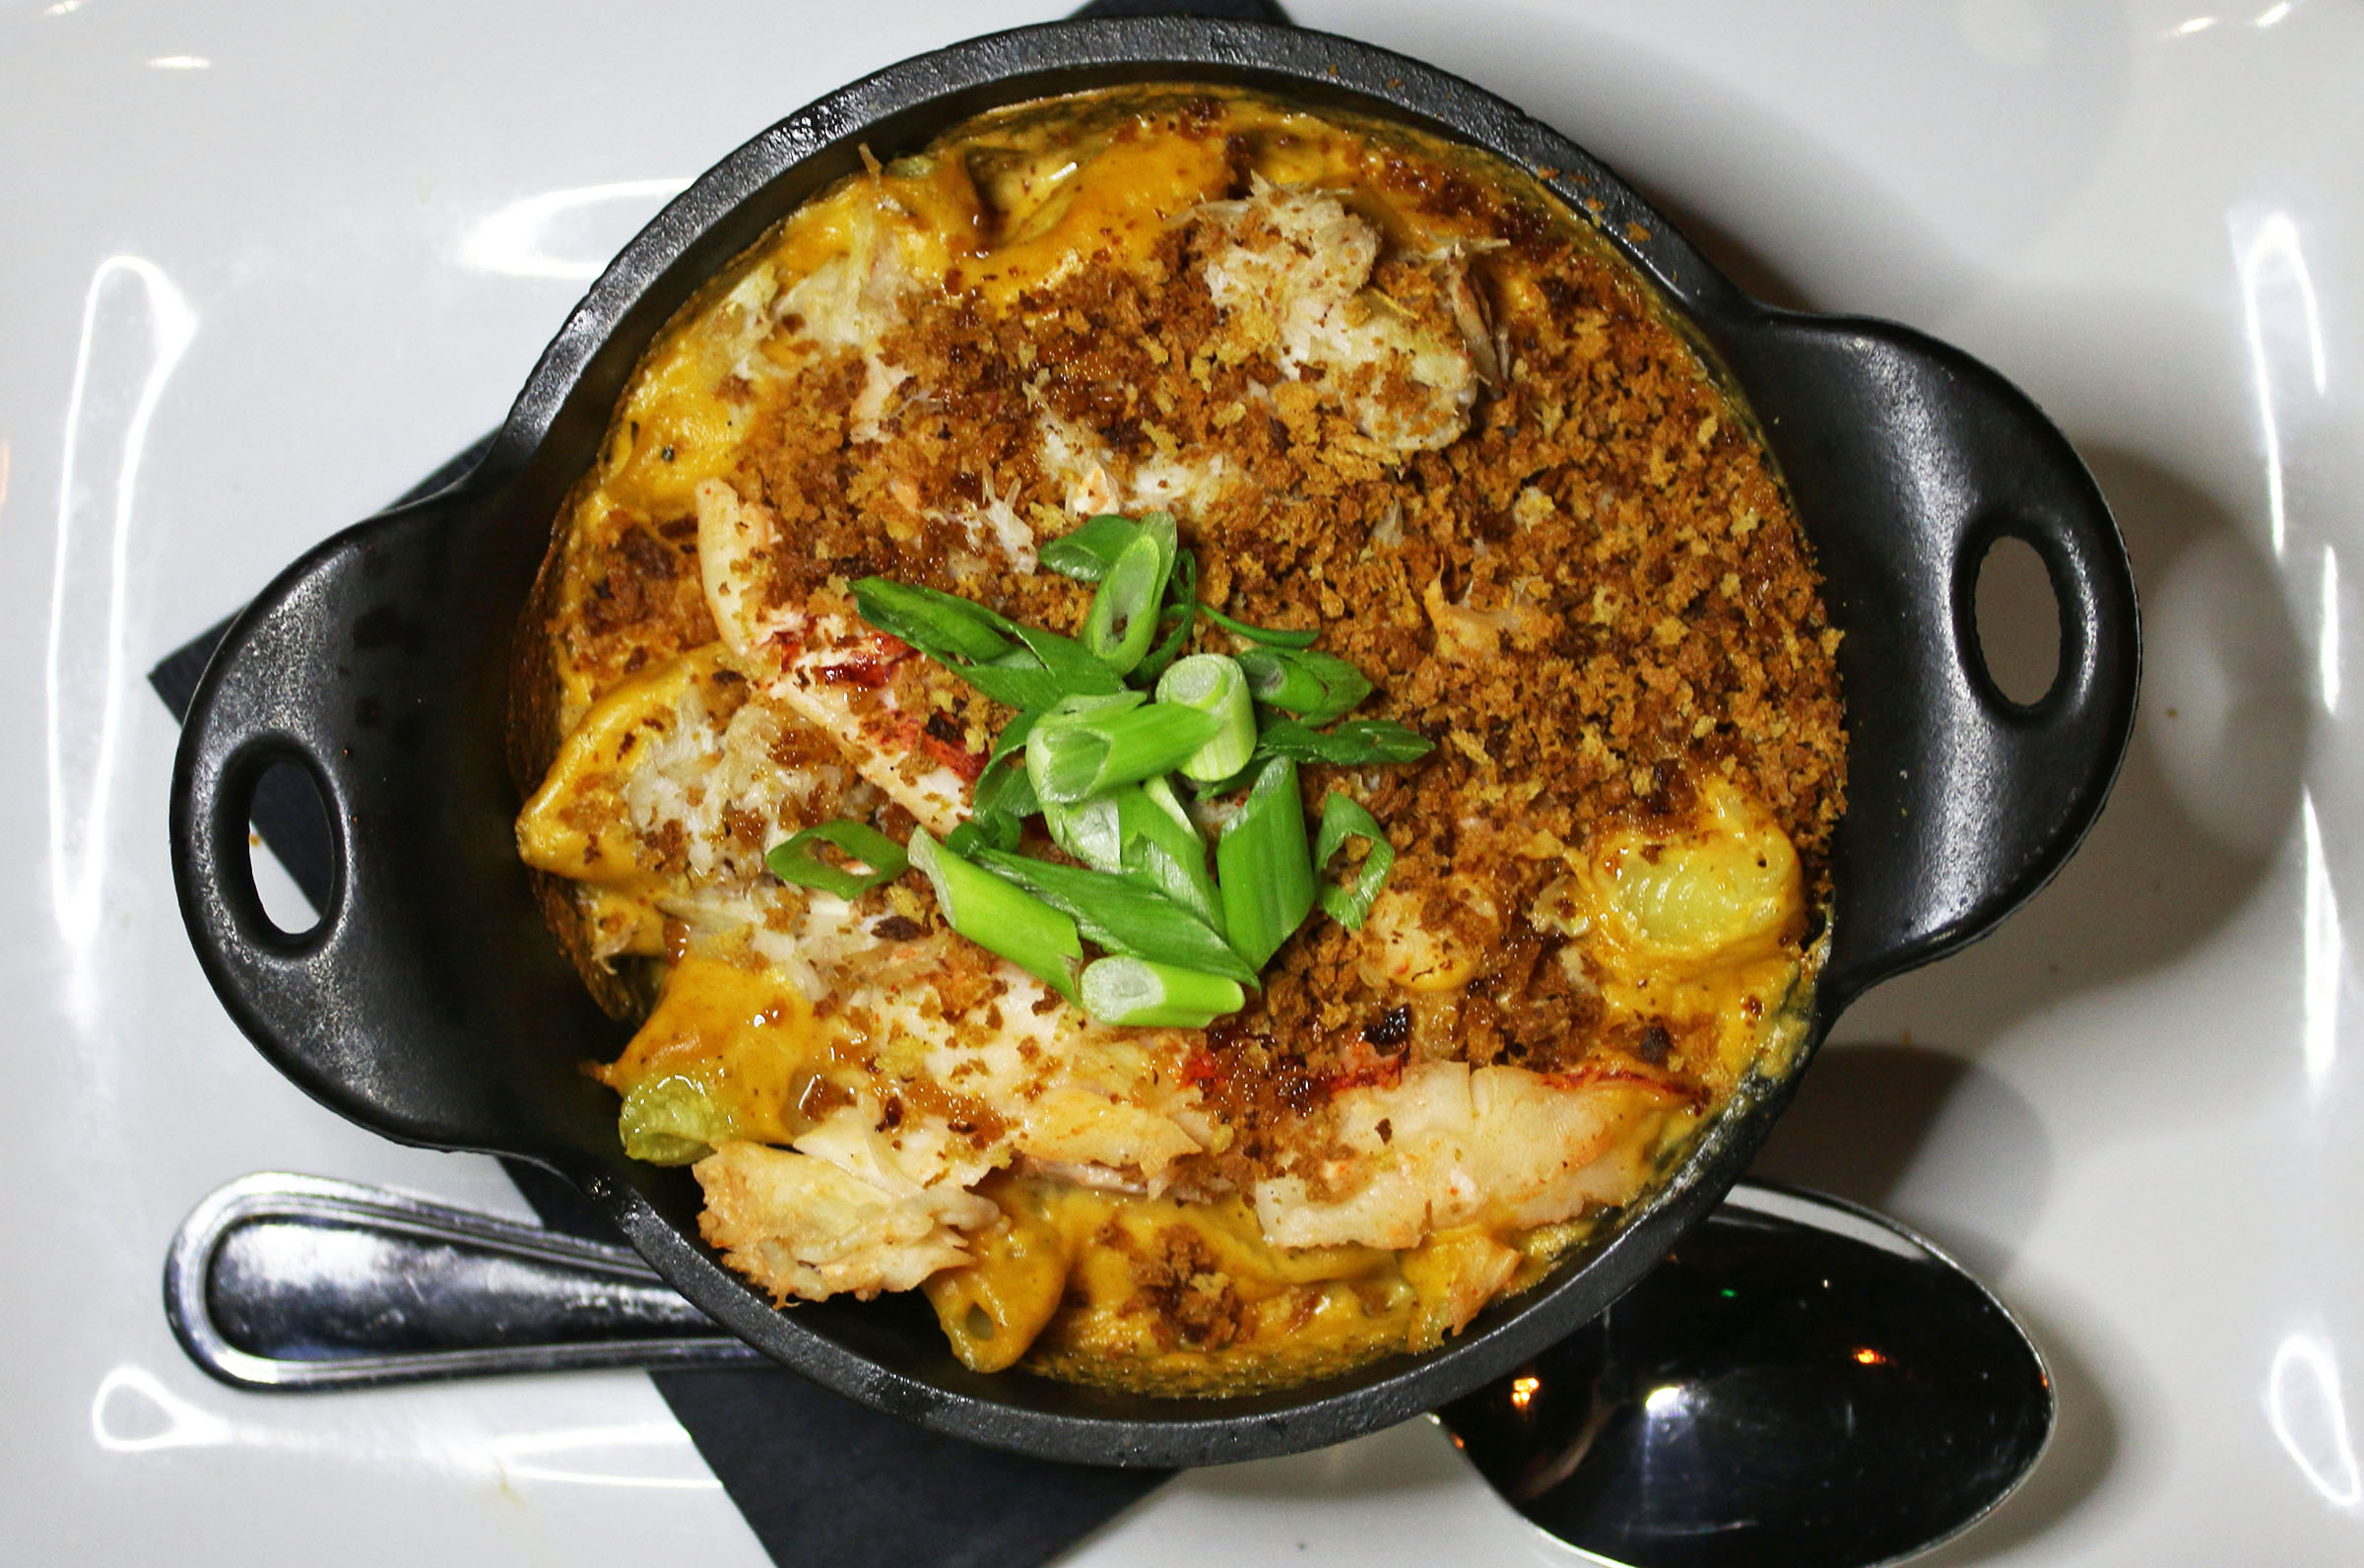 Lobster & Crab Mac & Cheese: Five Cheese Fondue, Crispy Panko, White Truffle Oil